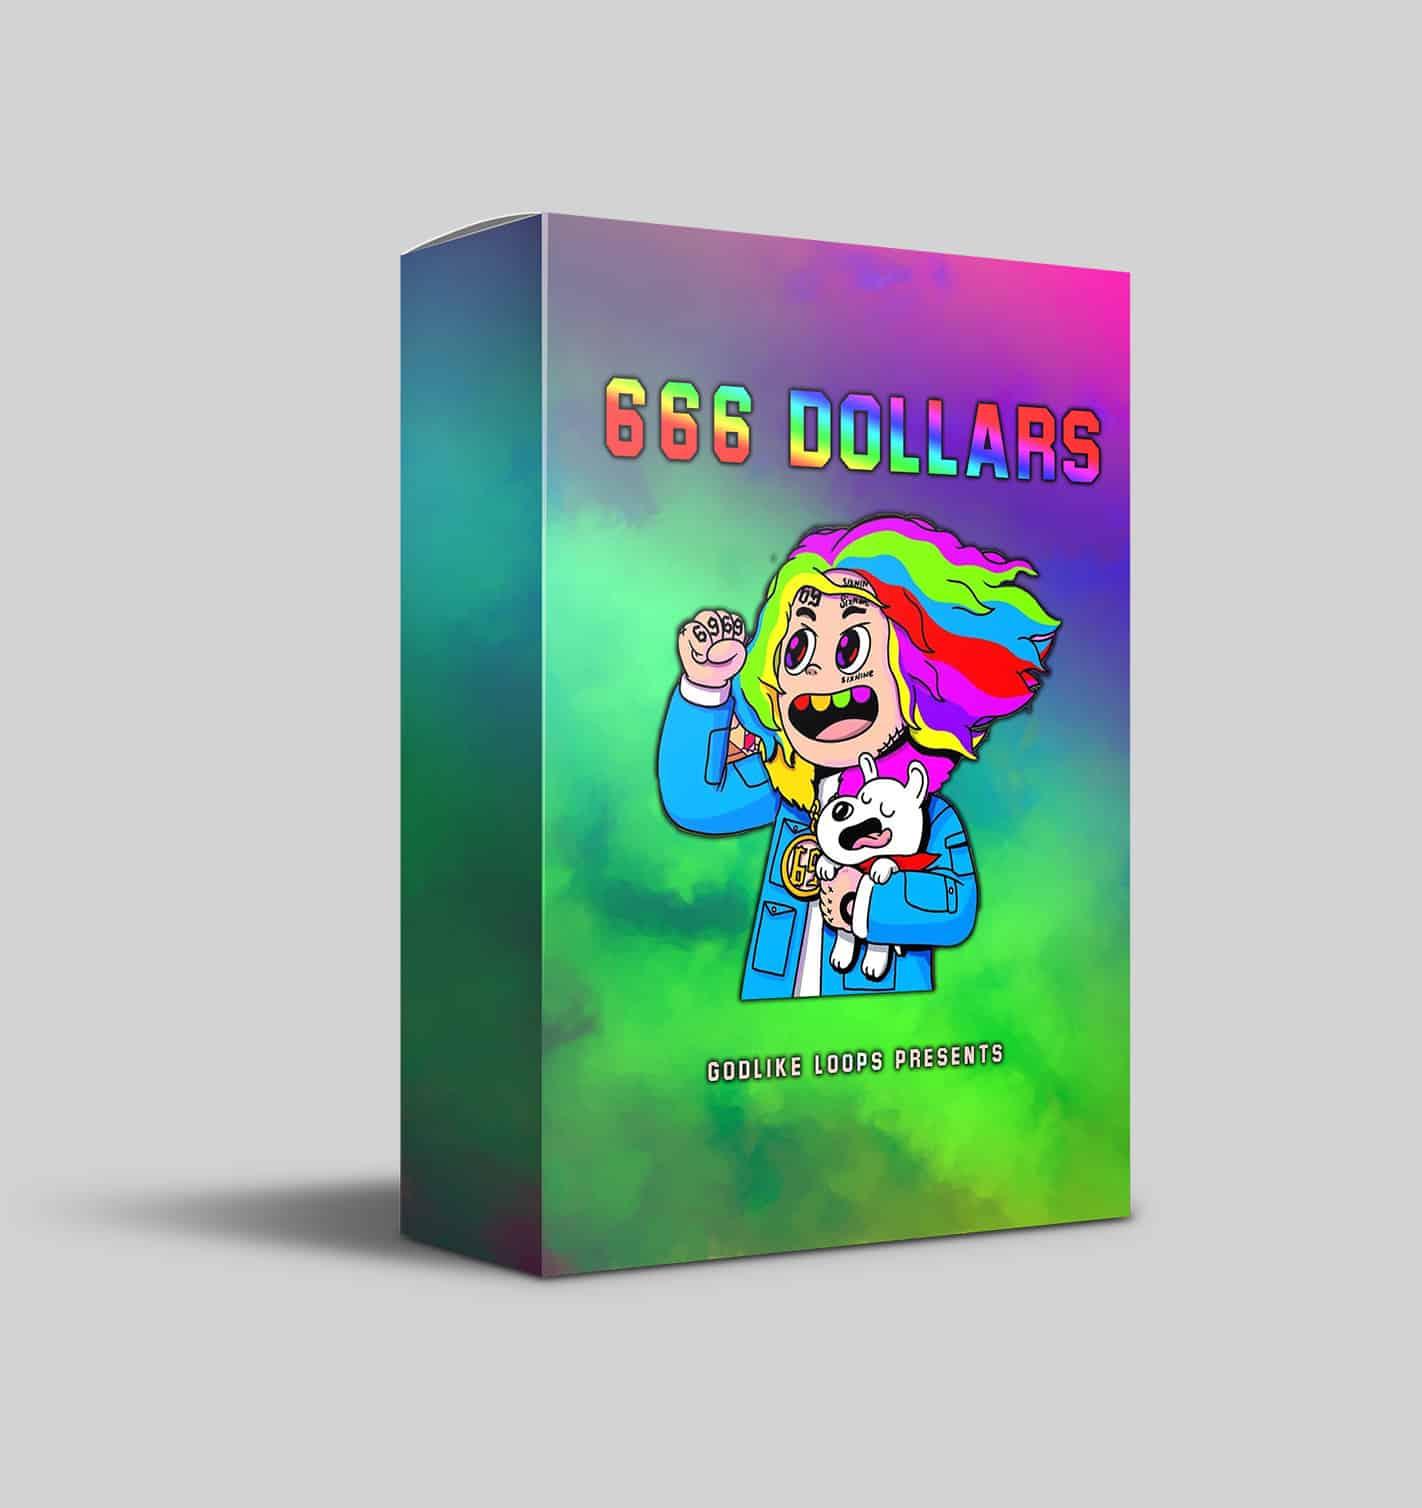 Godlile Loops - 666 Dollars